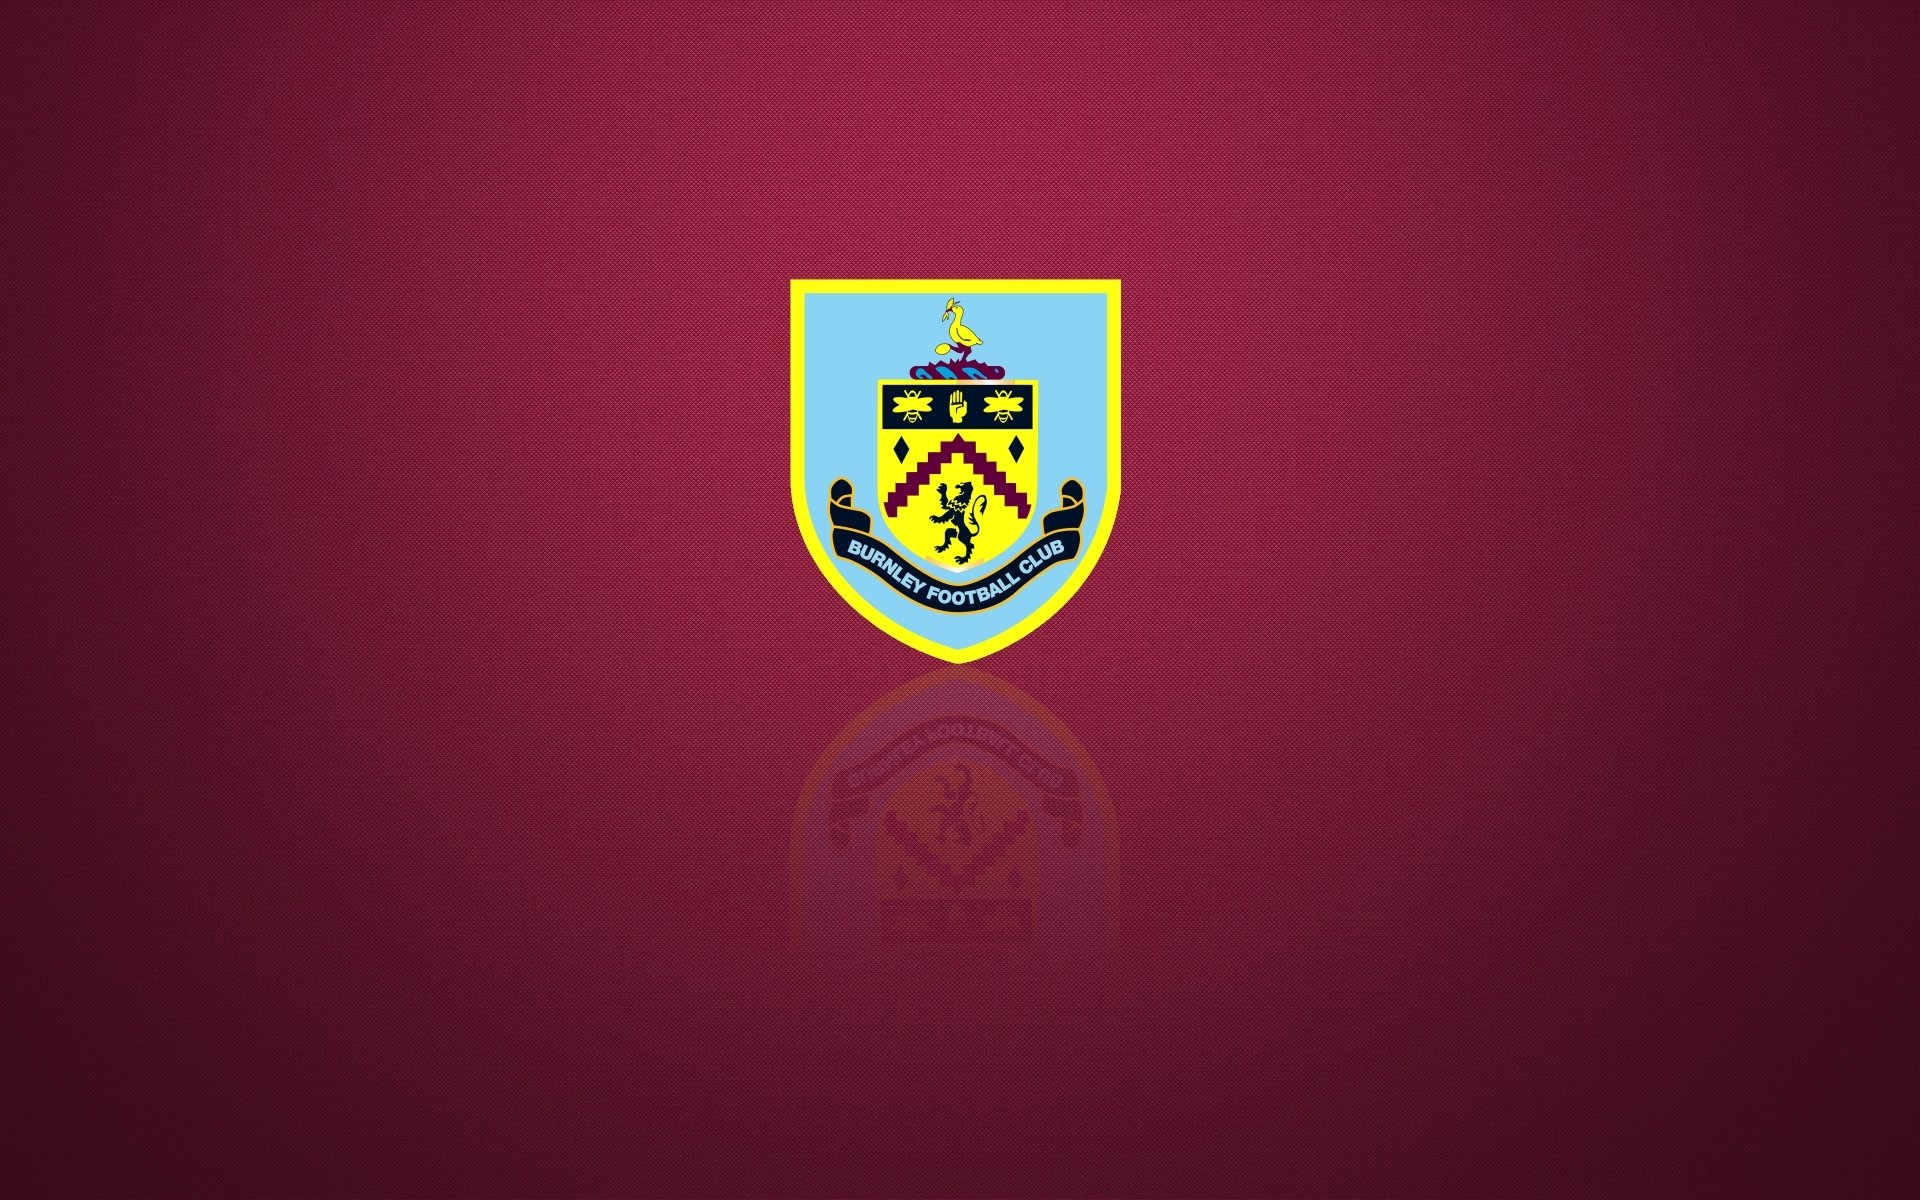 Burnley FC HD Wallpaper Background Image 1920x1200 ID 1920x1200